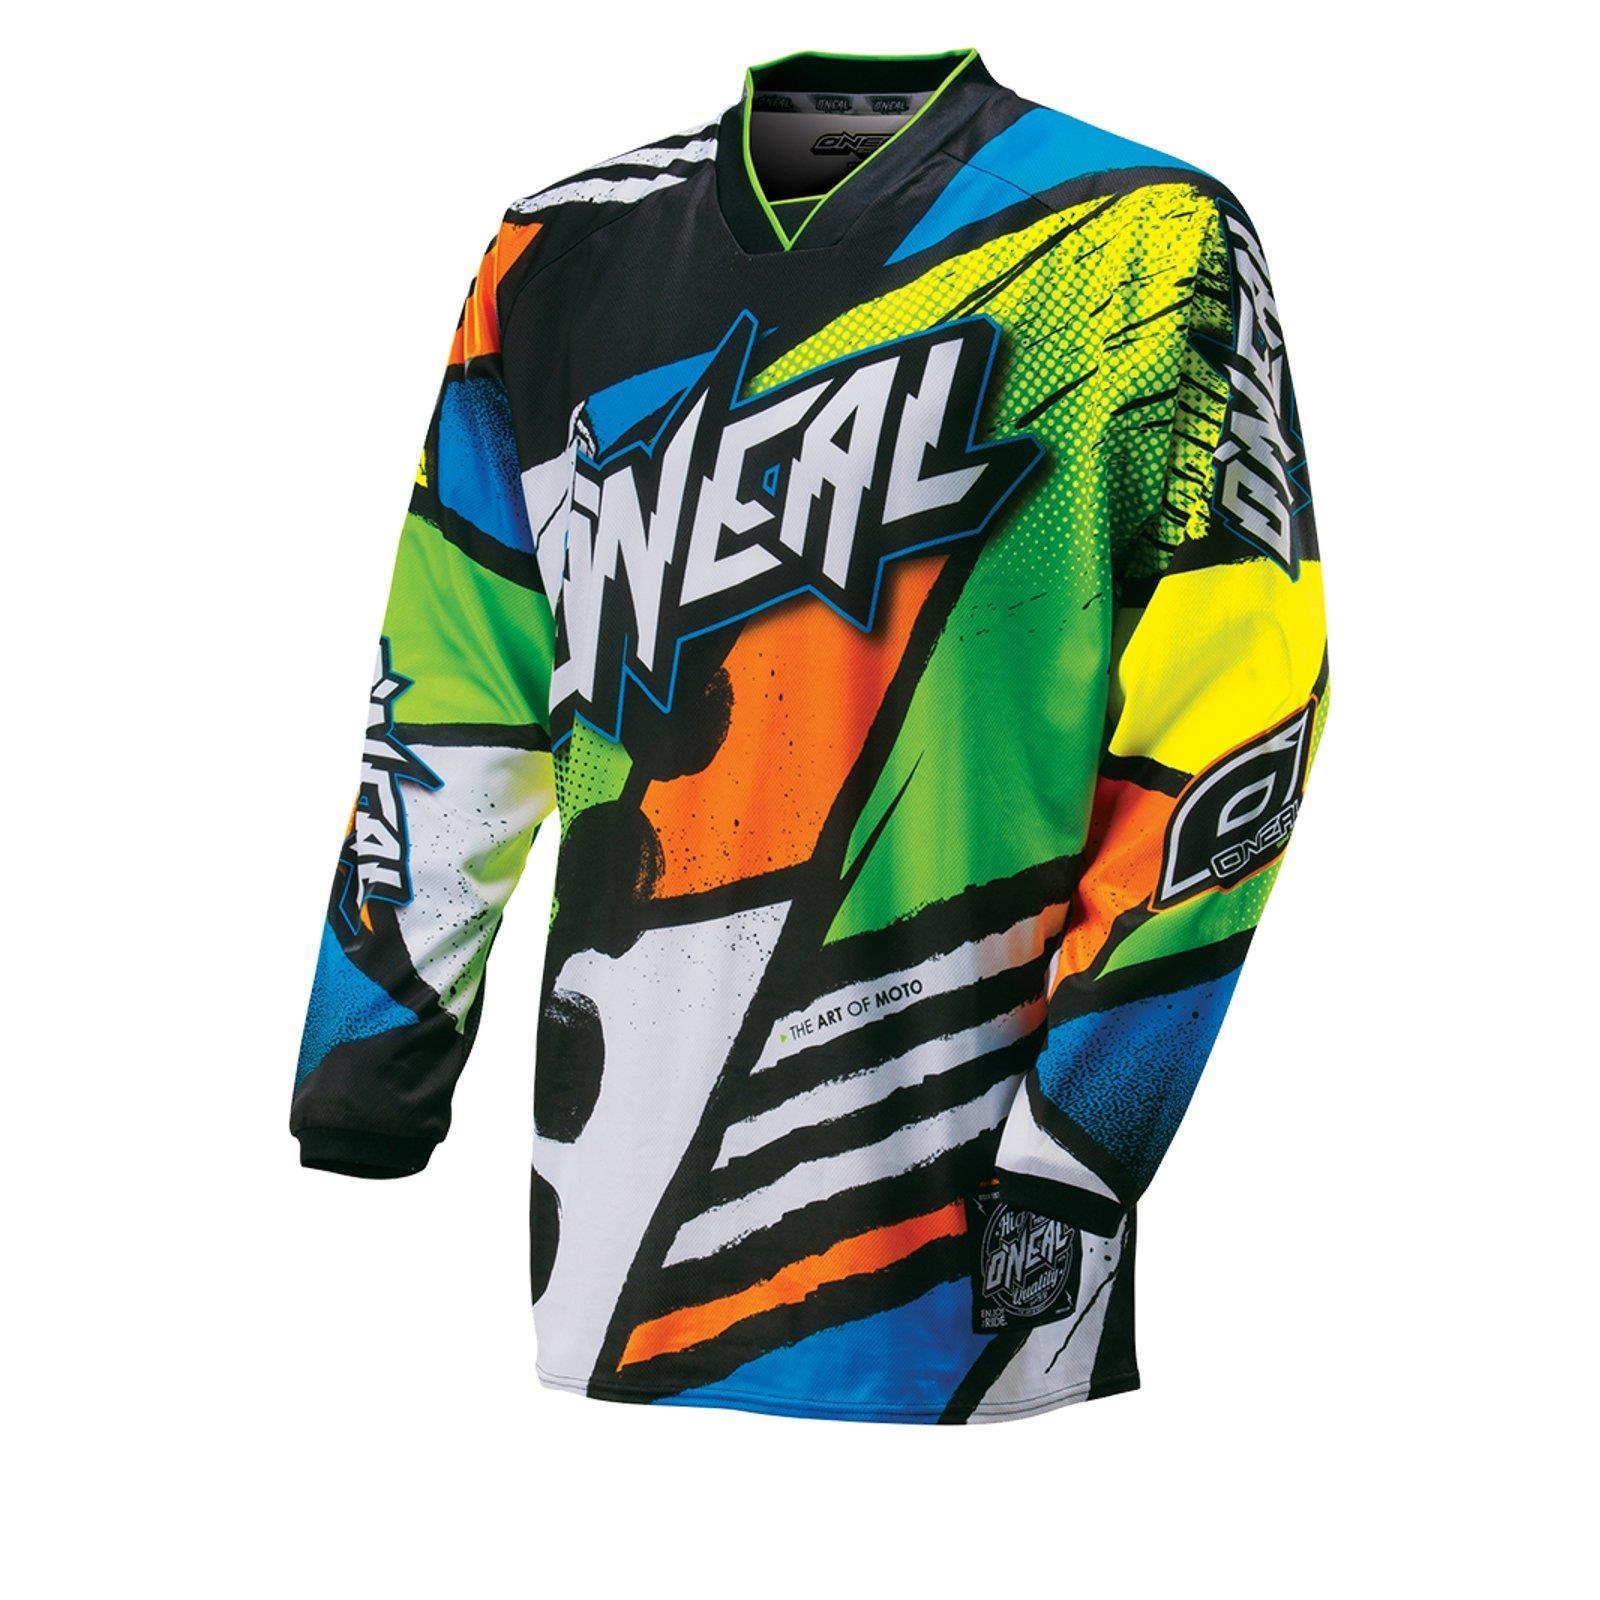 O-039-Neal-elemento-Mayhem-JERSEY-Racewear-Motocross-Maglia-MX-DH-FR-MTB-MOUNTAIN-BIKE miniatura 91